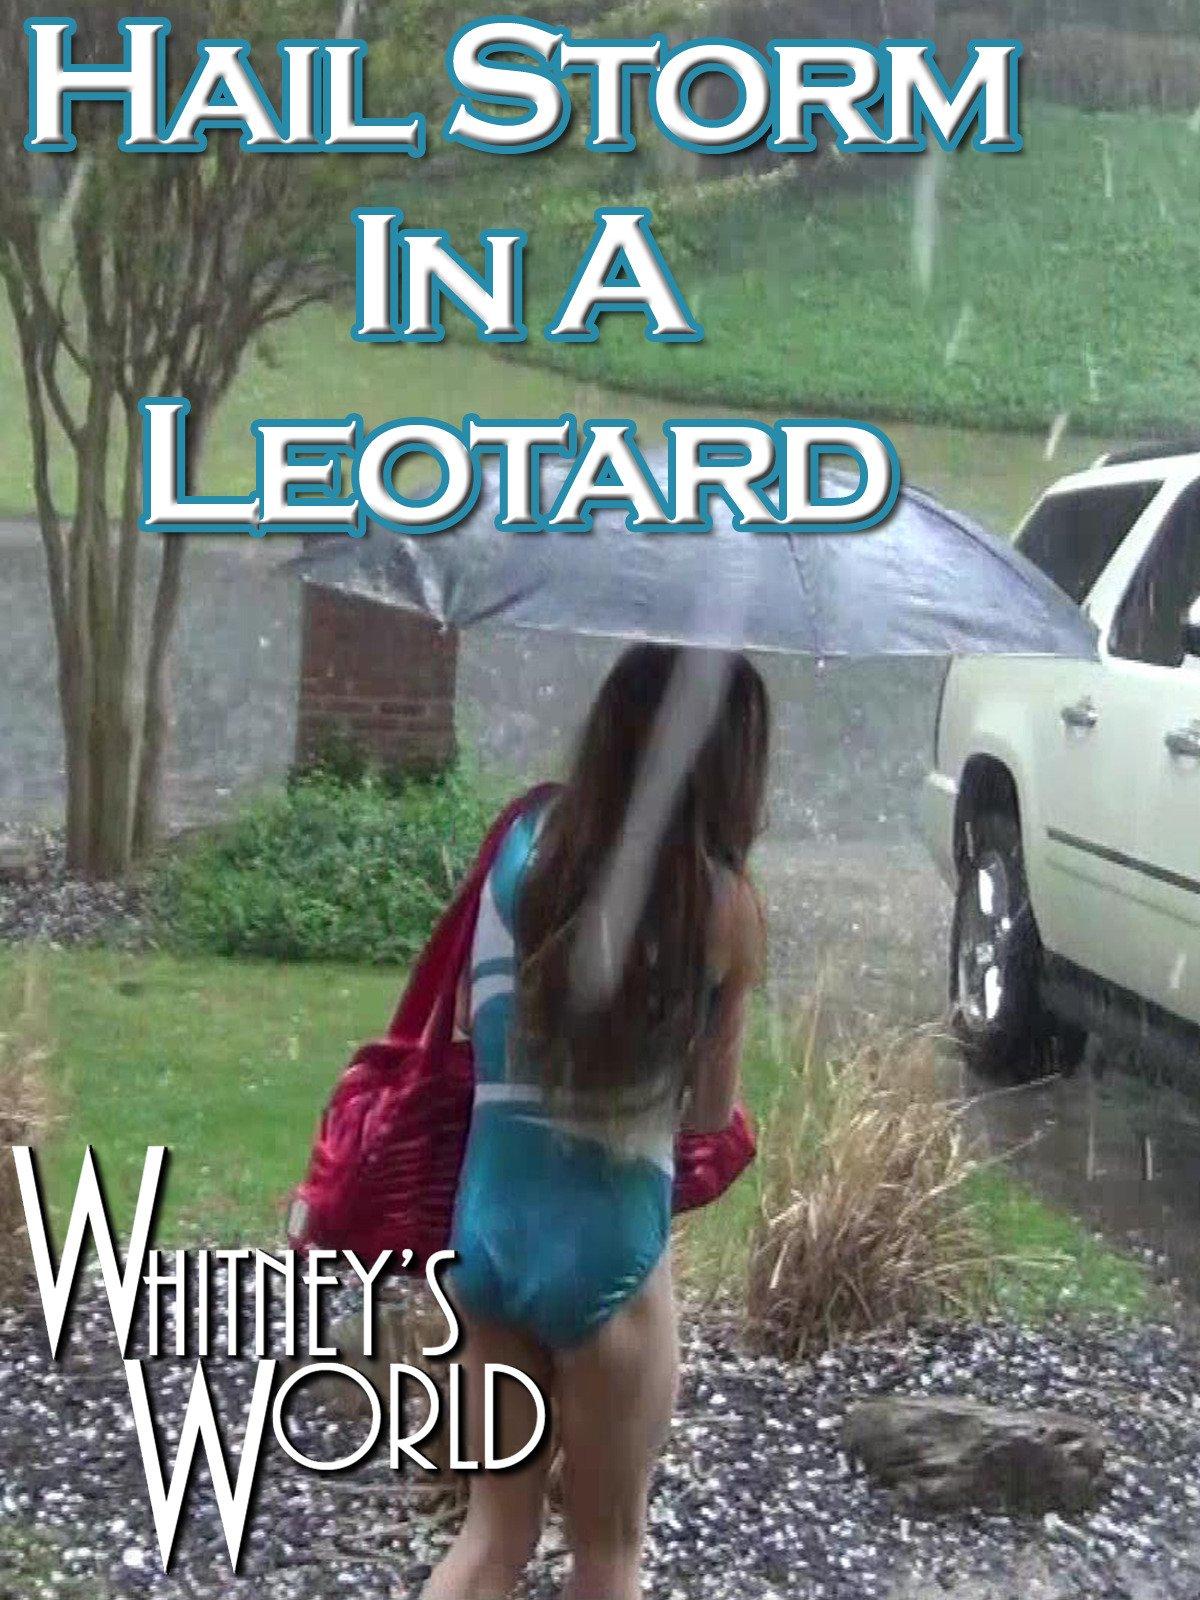 Hail Storm in a Leotard